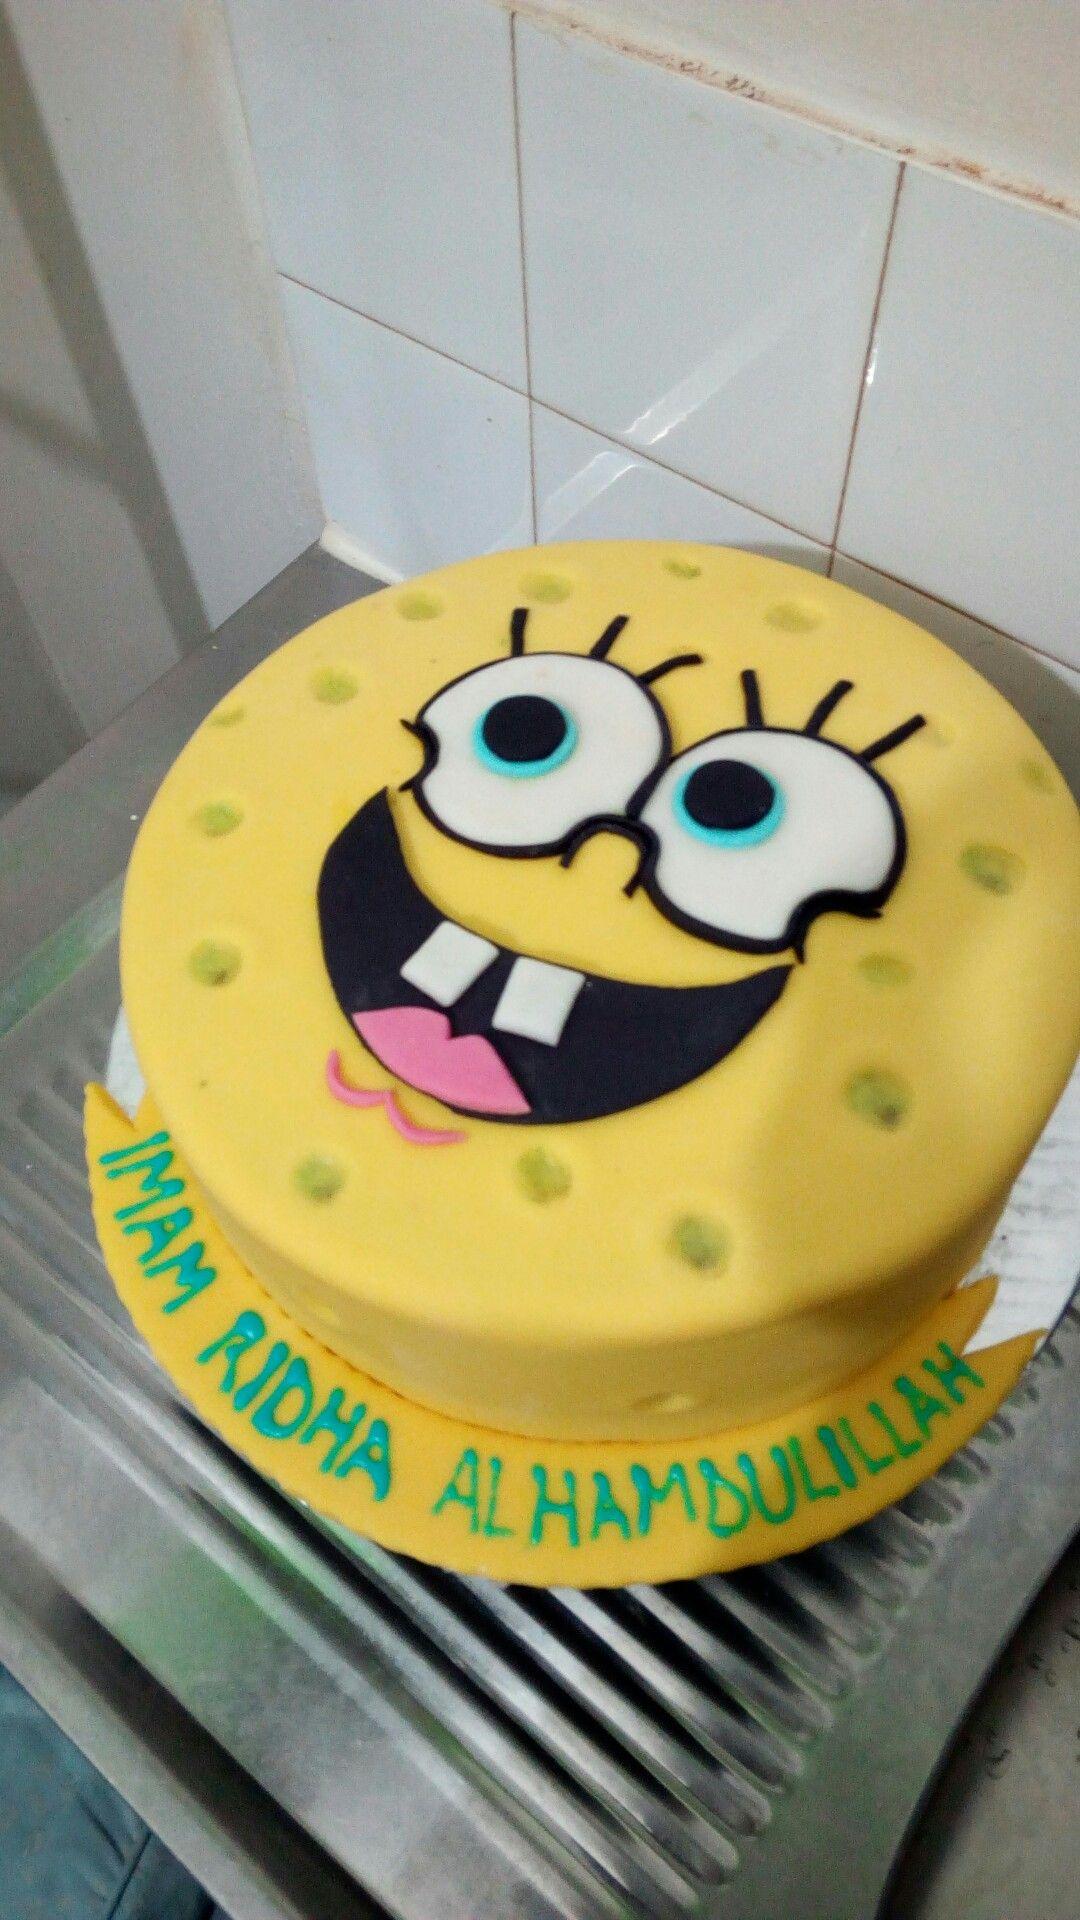 Spongebob Cake Alhamdulillah